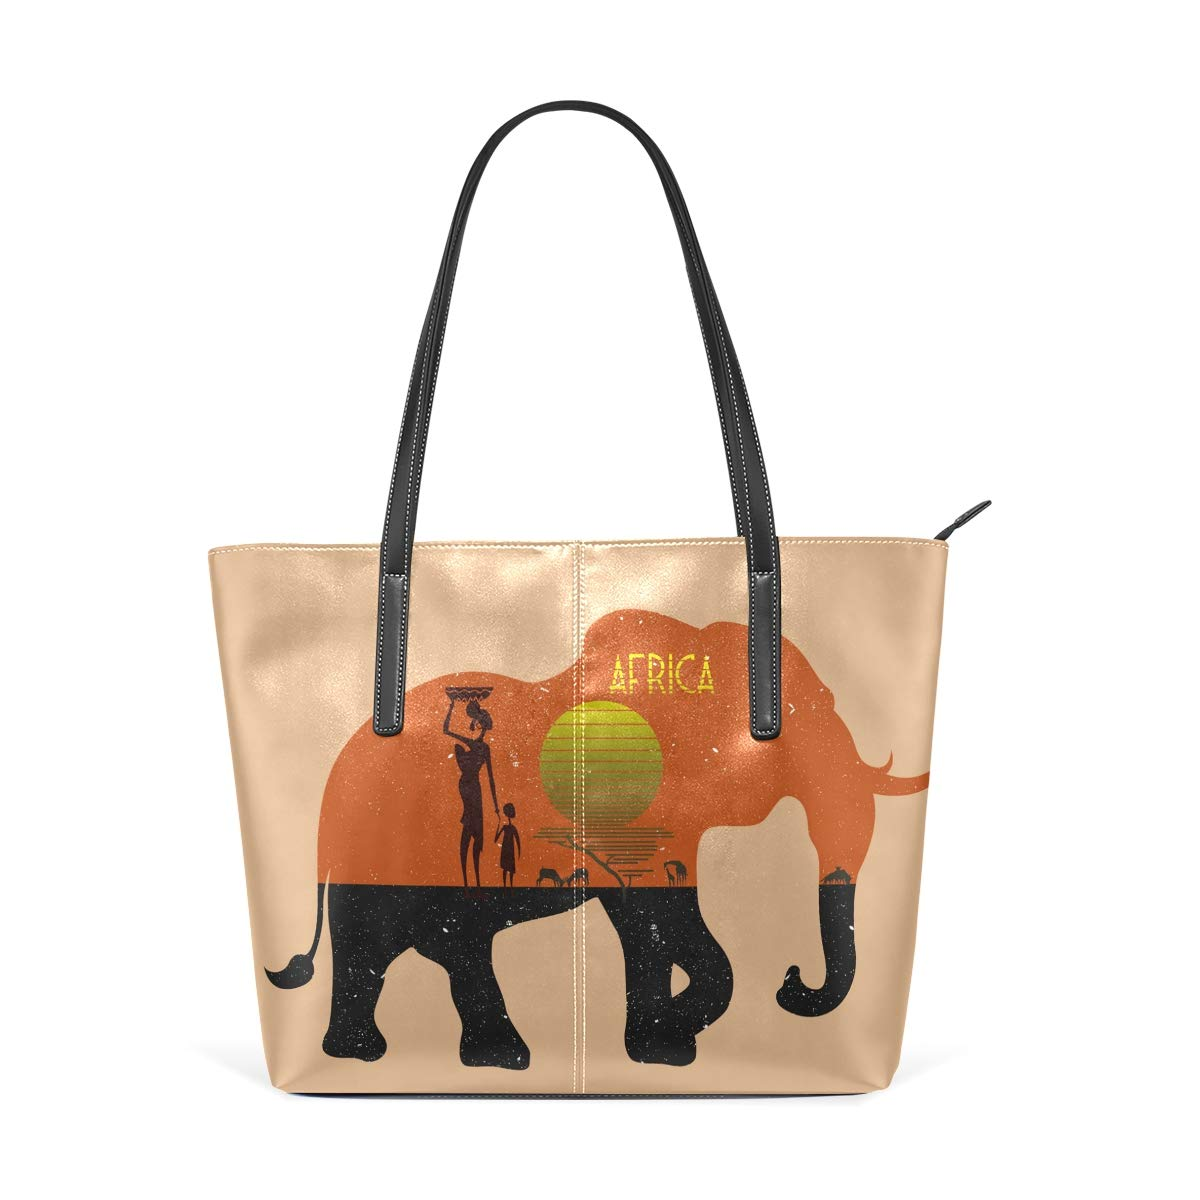 Cartoon Elephant Blue Flower Womens PU Leather Tote Shoulder Bags Handbags Casual Bag